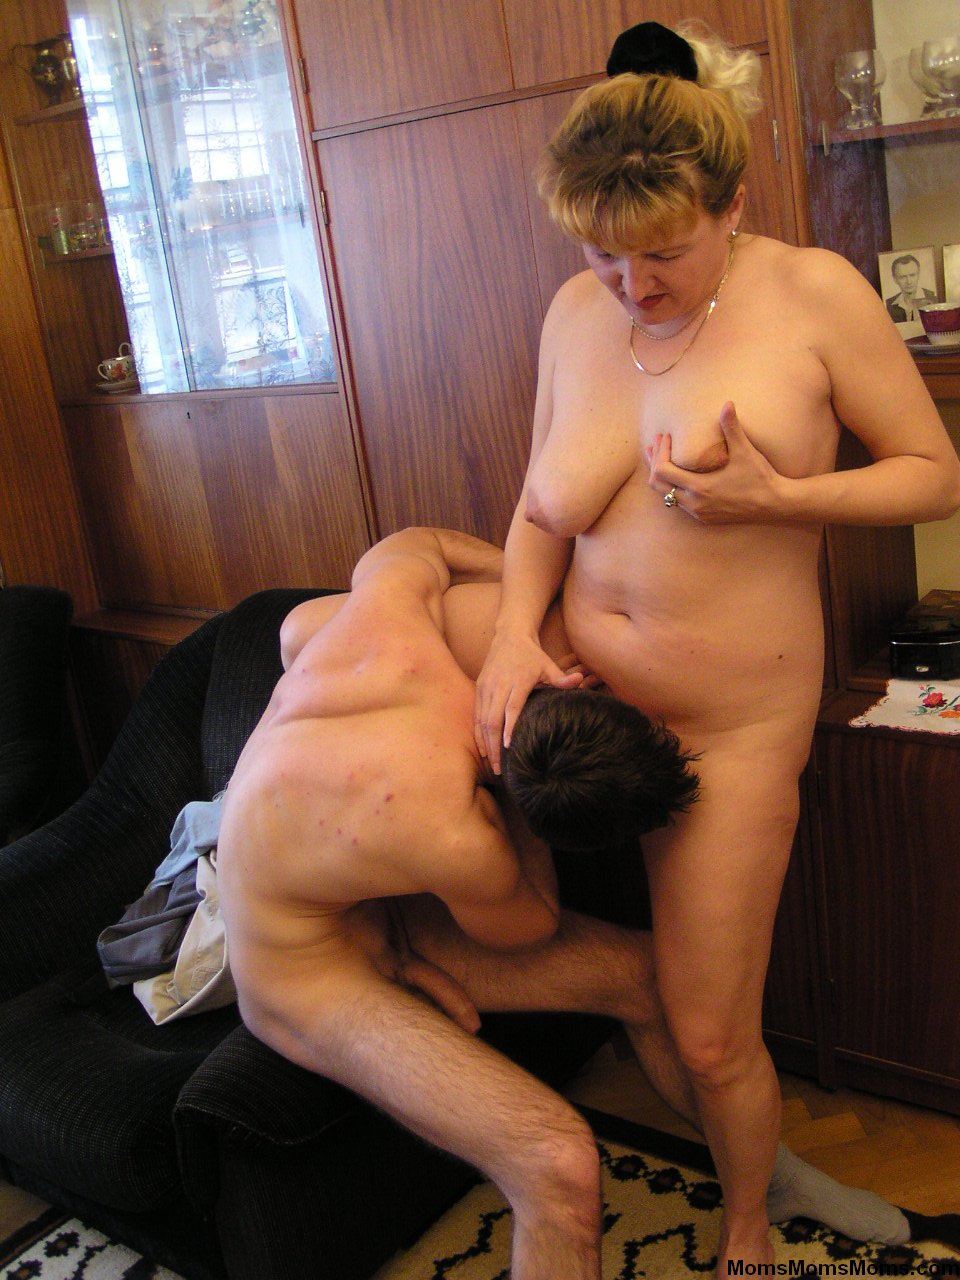 Сын и матъ секс фото 22 фотография